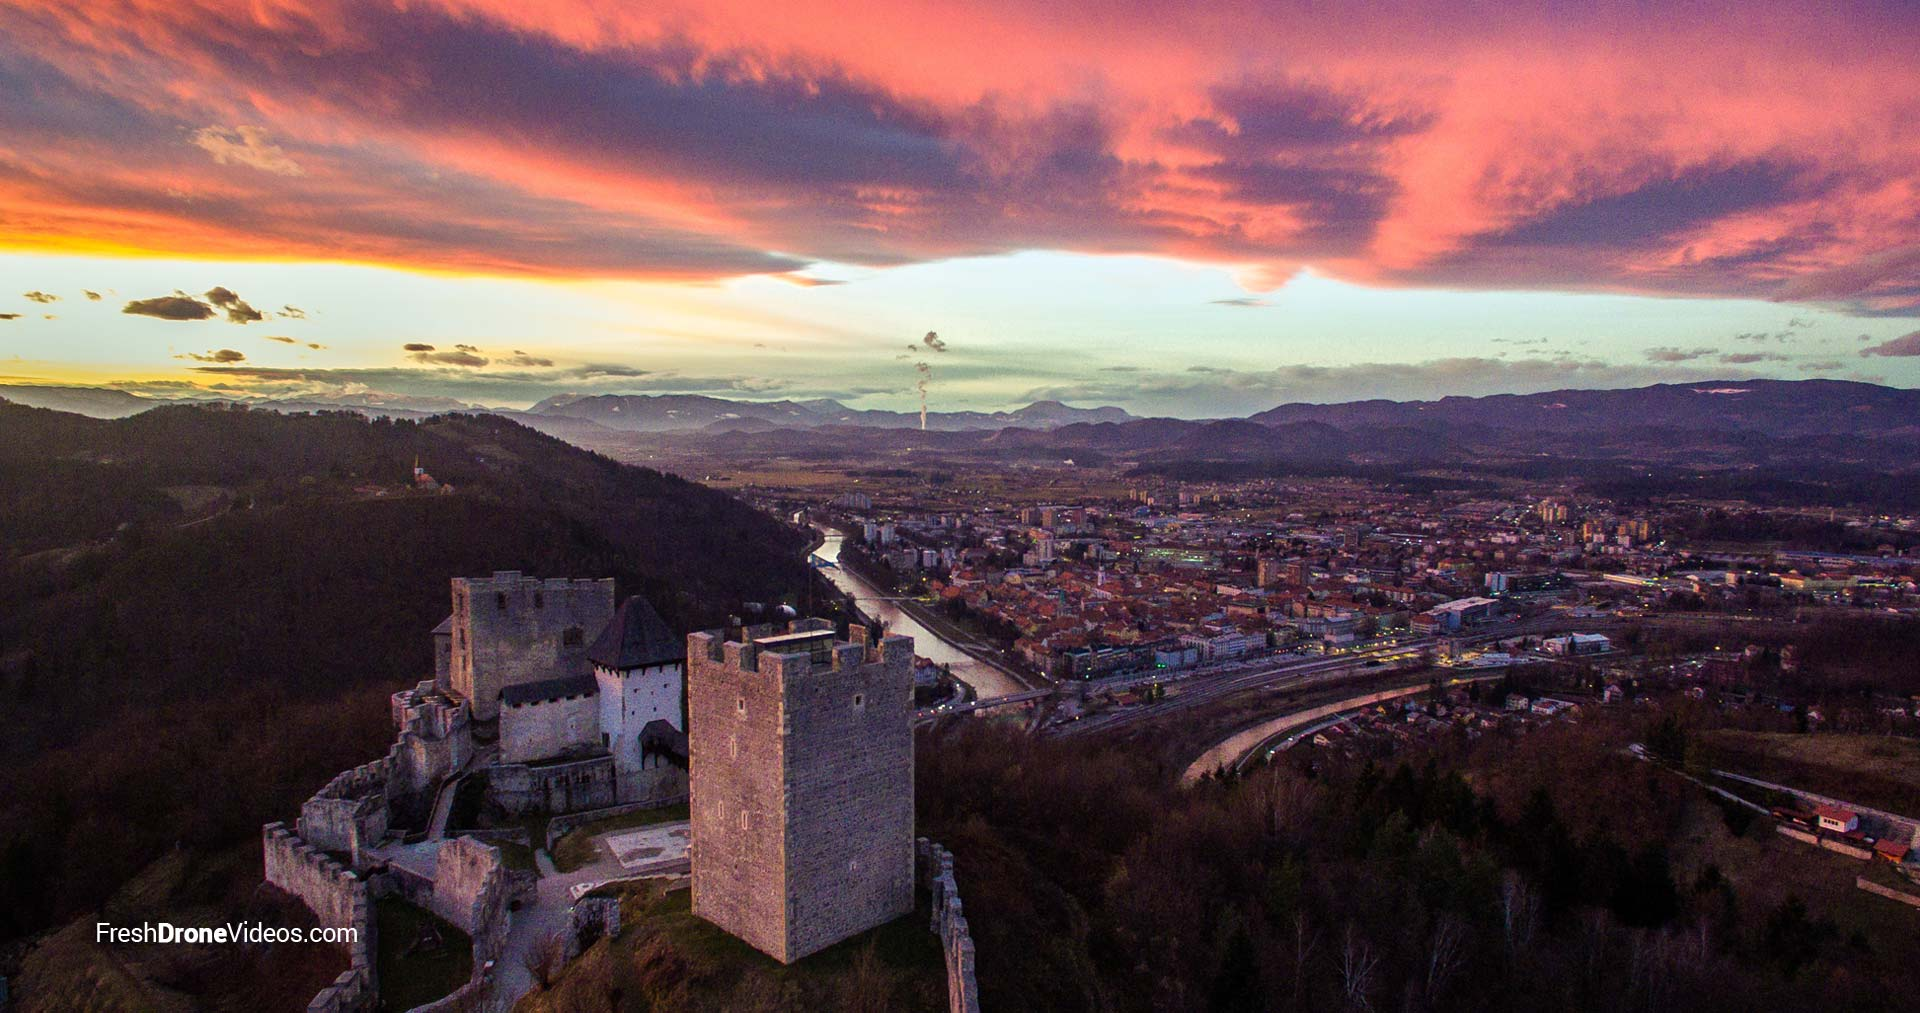 Celje clouds 4k 1920 web 10 Reasons To Visit Slovenia